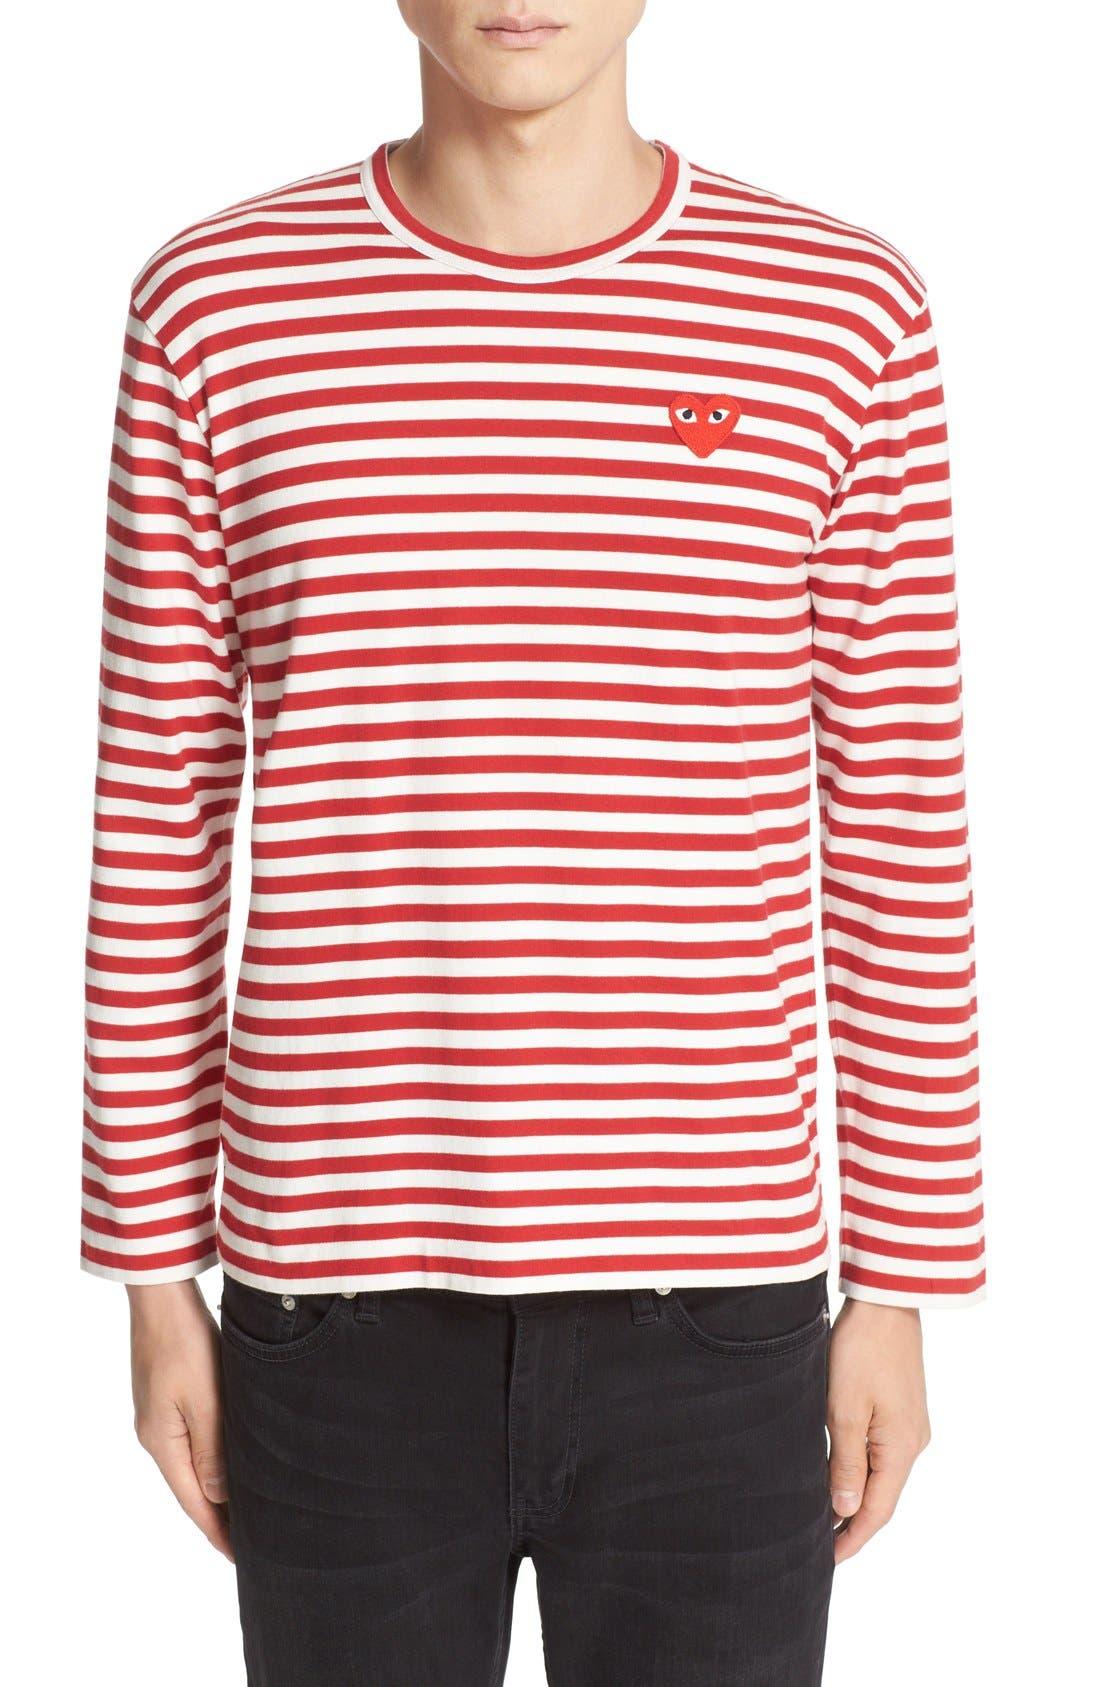 COMME DES GARÇONS PLAY, Stripe Long Sleeve T-Shirt, Main thumbnail 1, color, RED/ WHITE